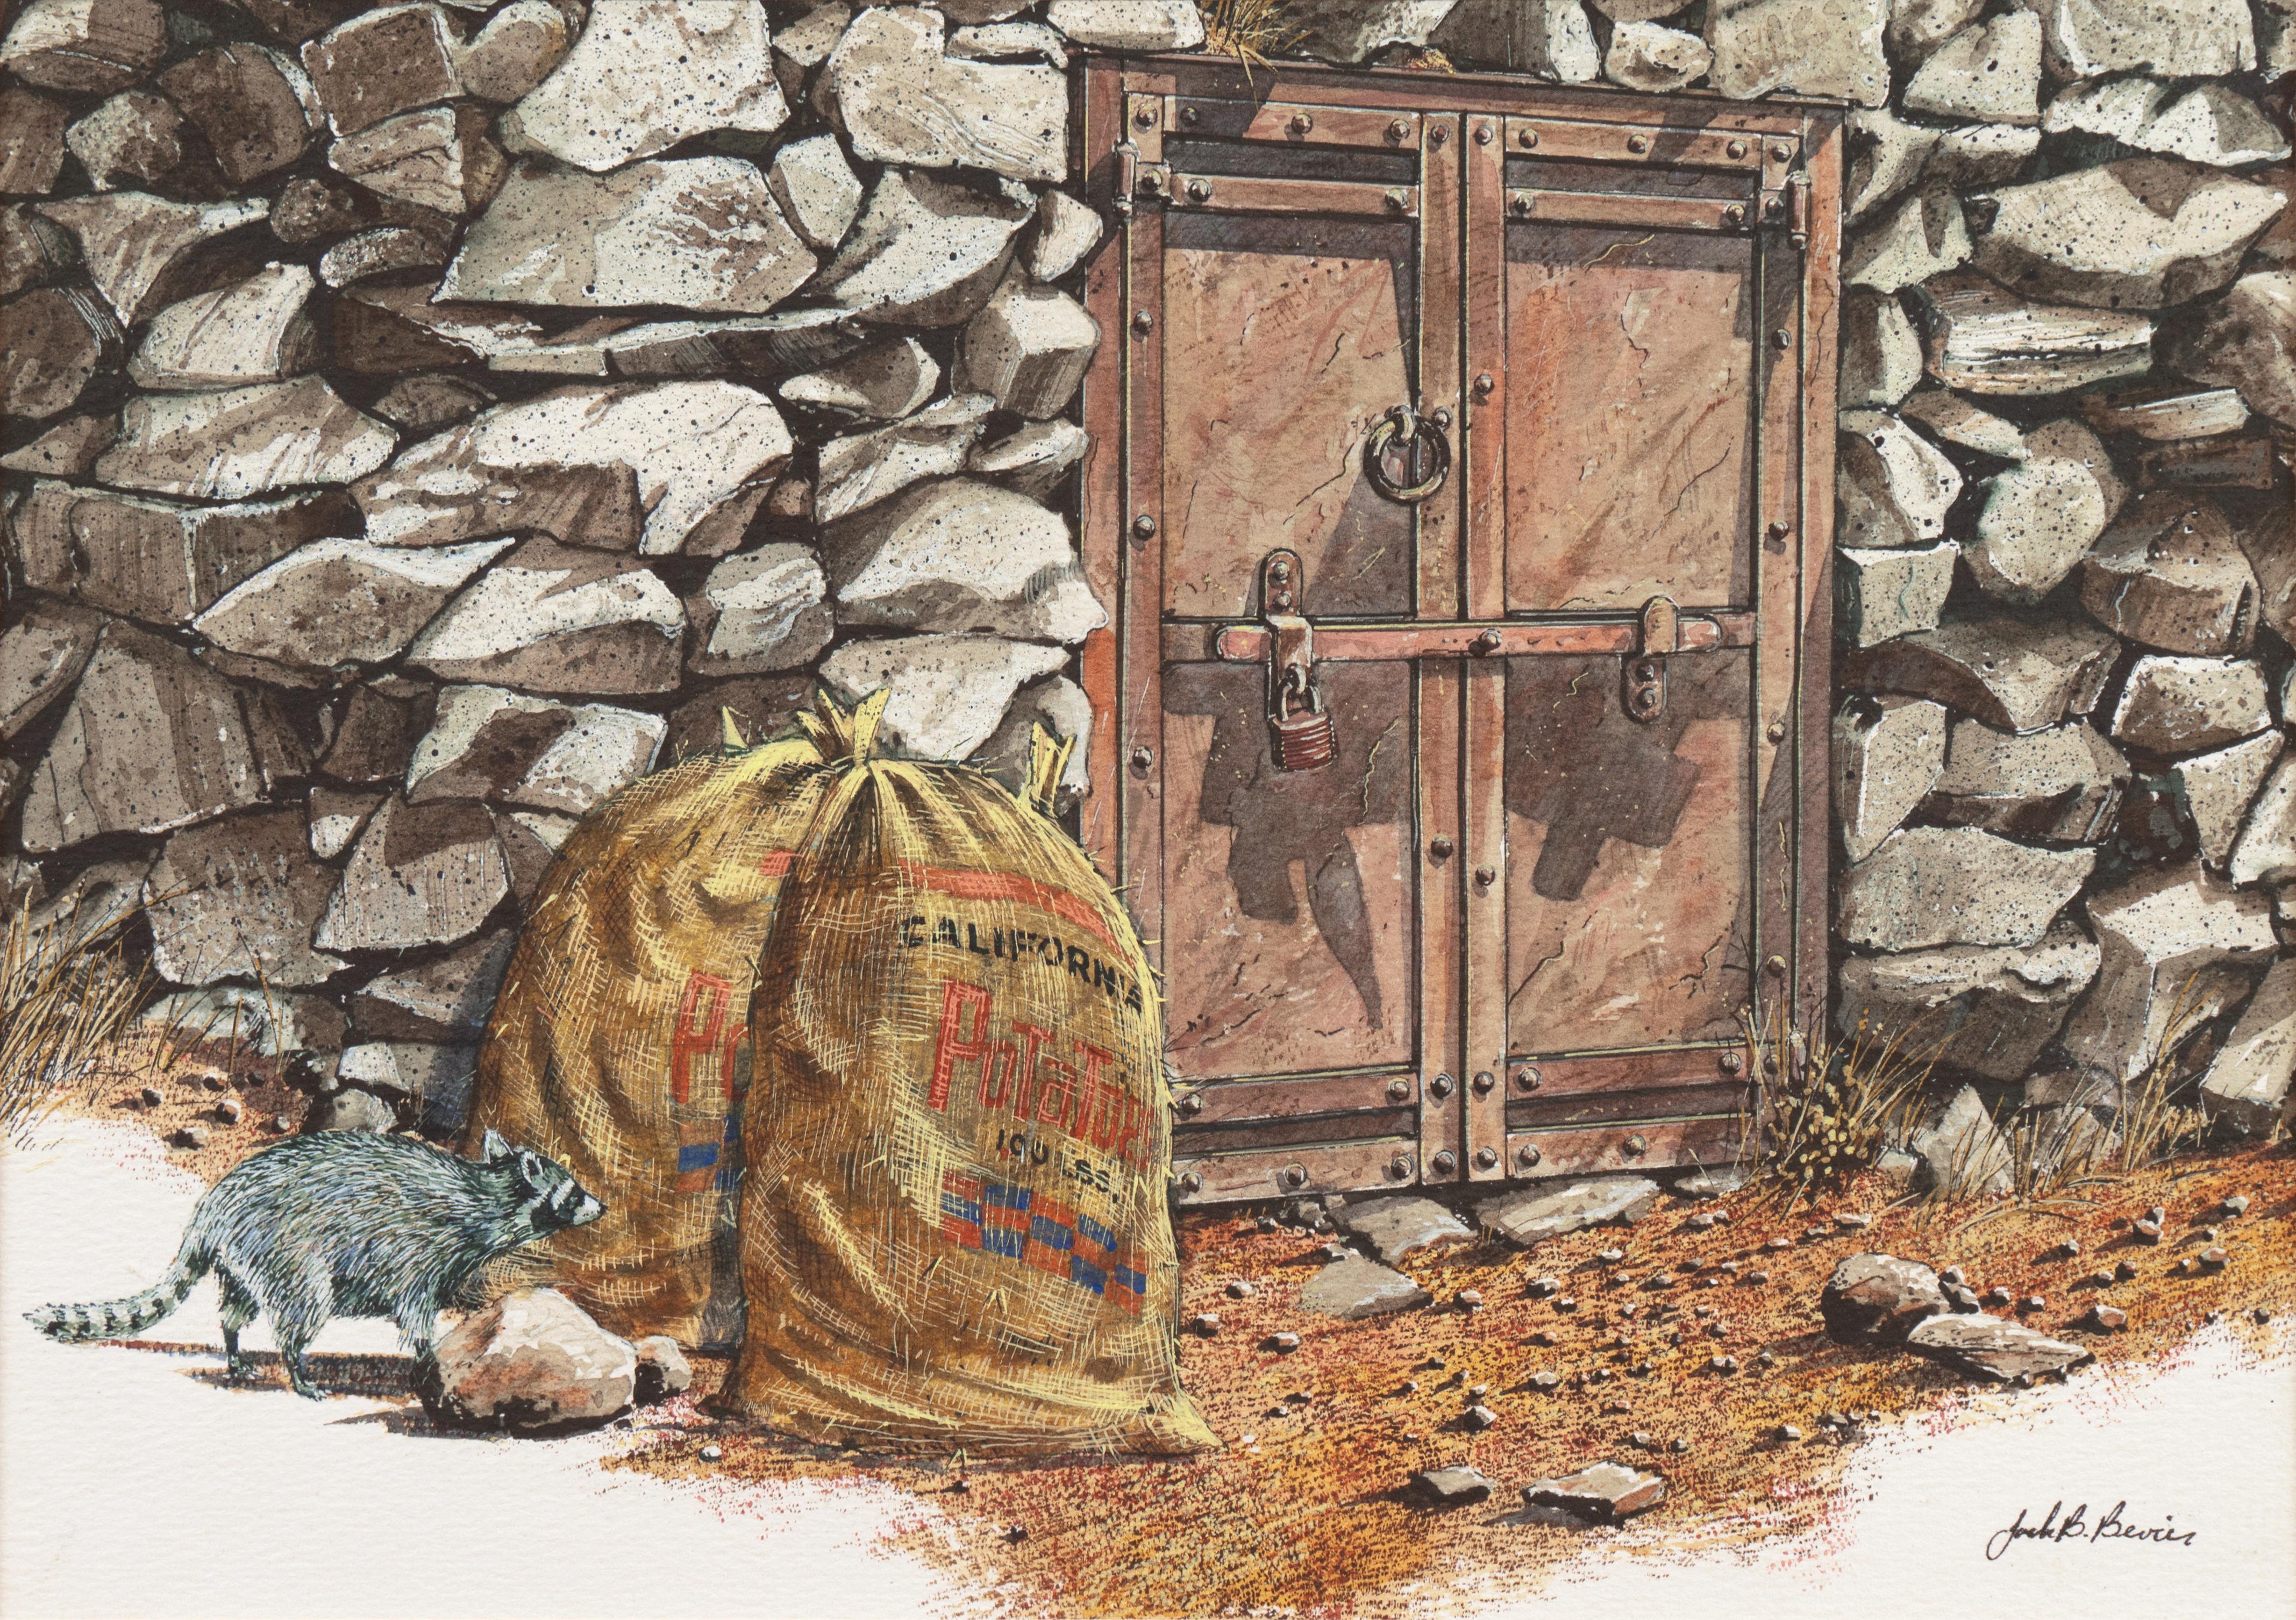 'The Little Bandit', California Raccoon, National Watercolor Society